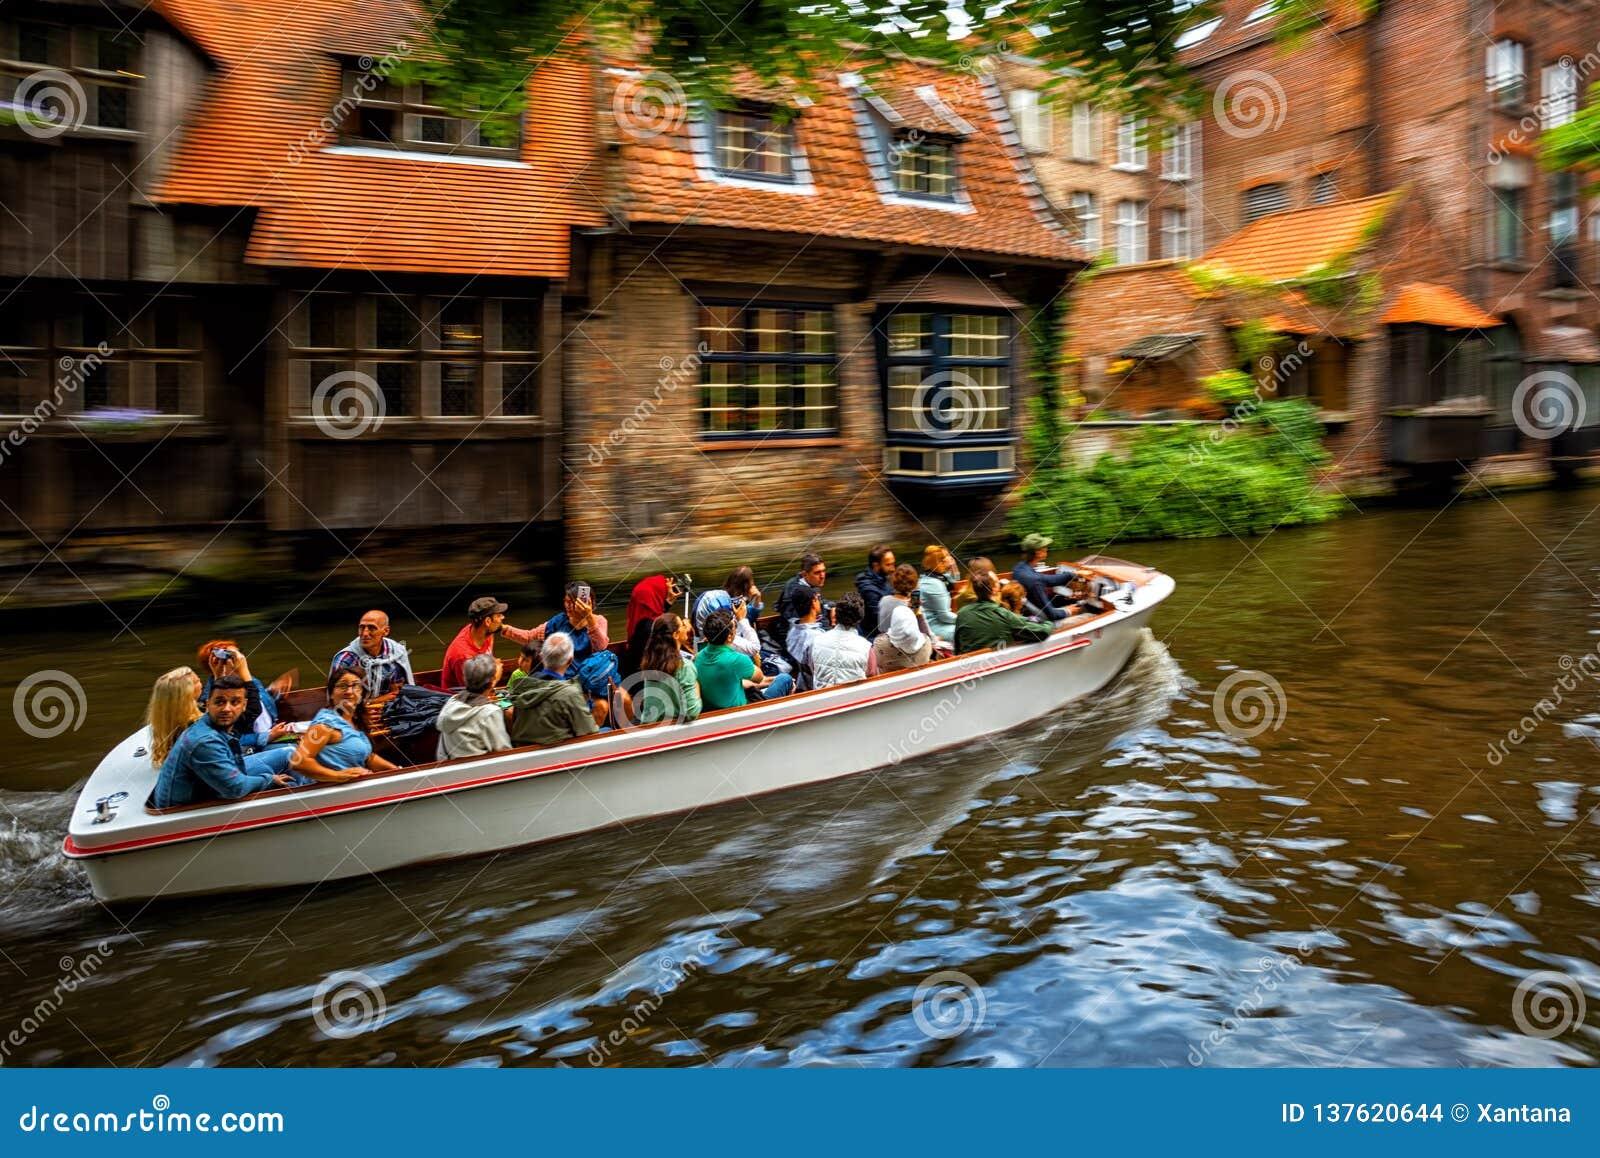 Touristischer Kanalbootsausflug in alter Stadt Brügges, Belgien